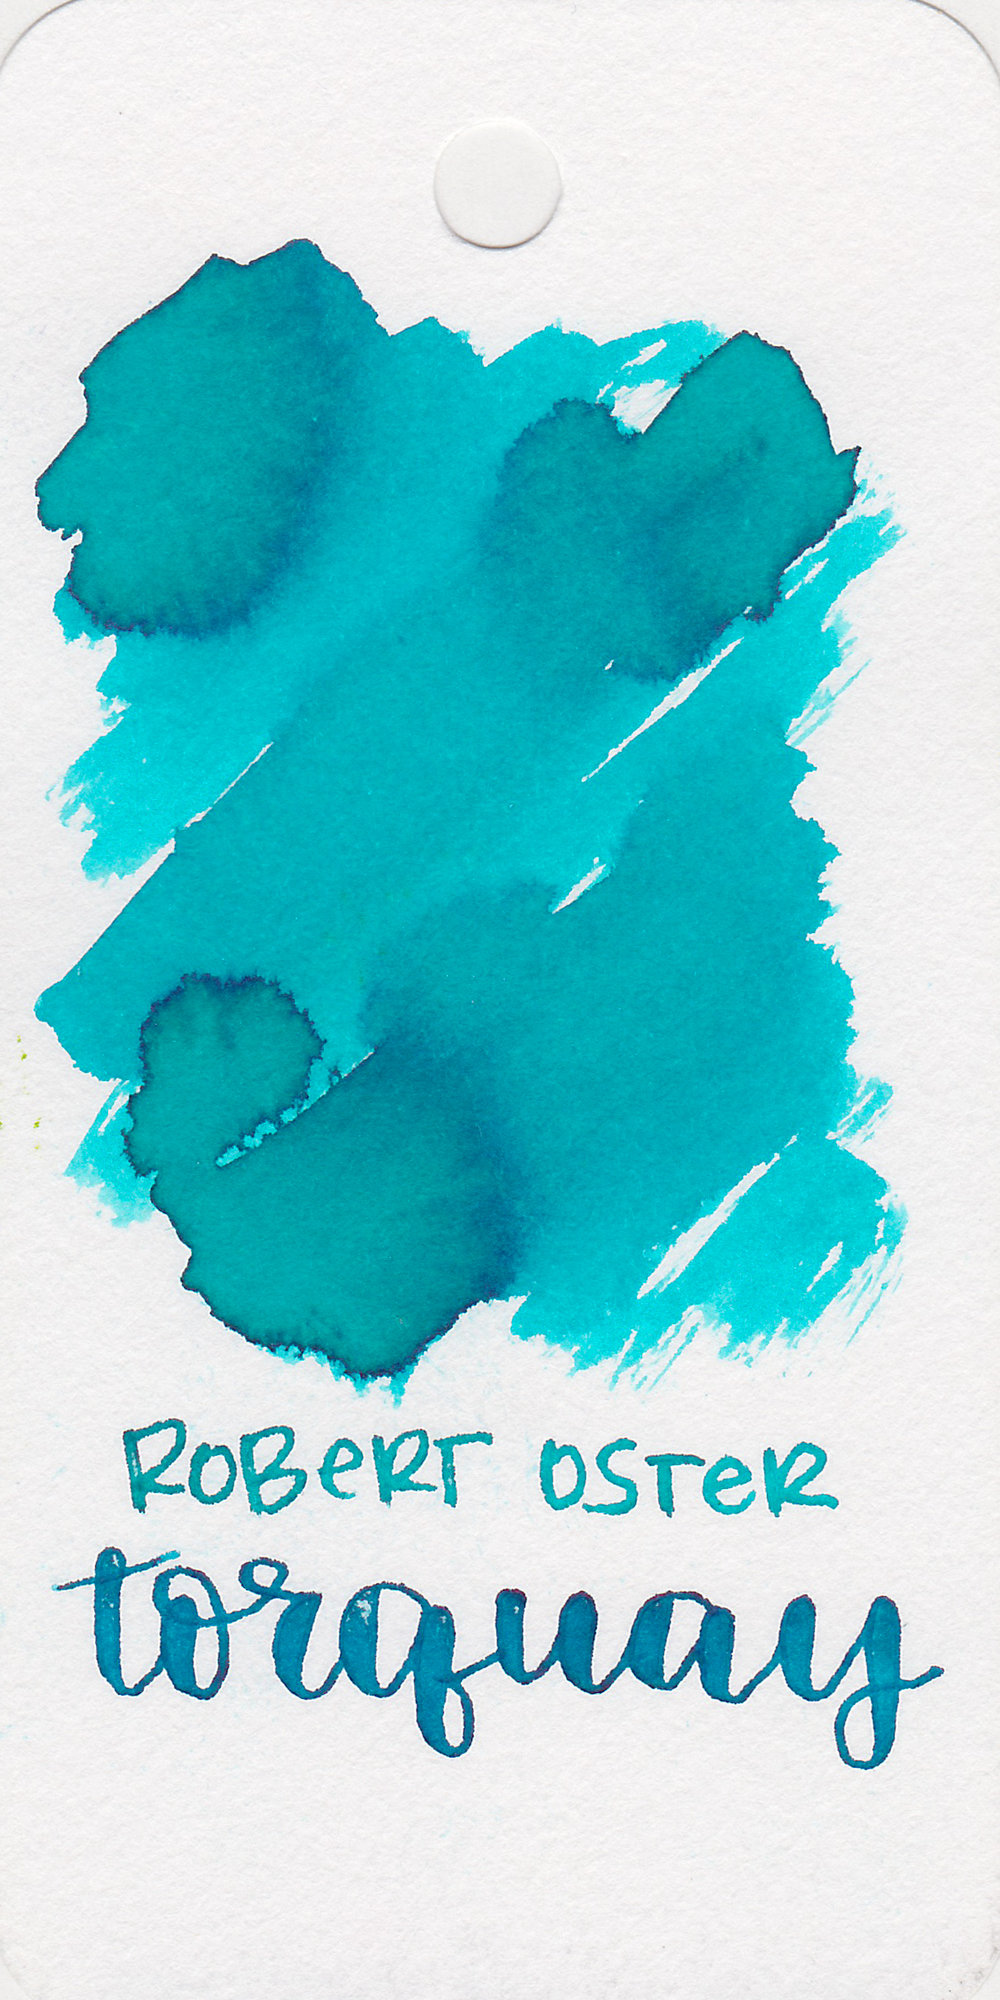 ro-torquay-1.jpg